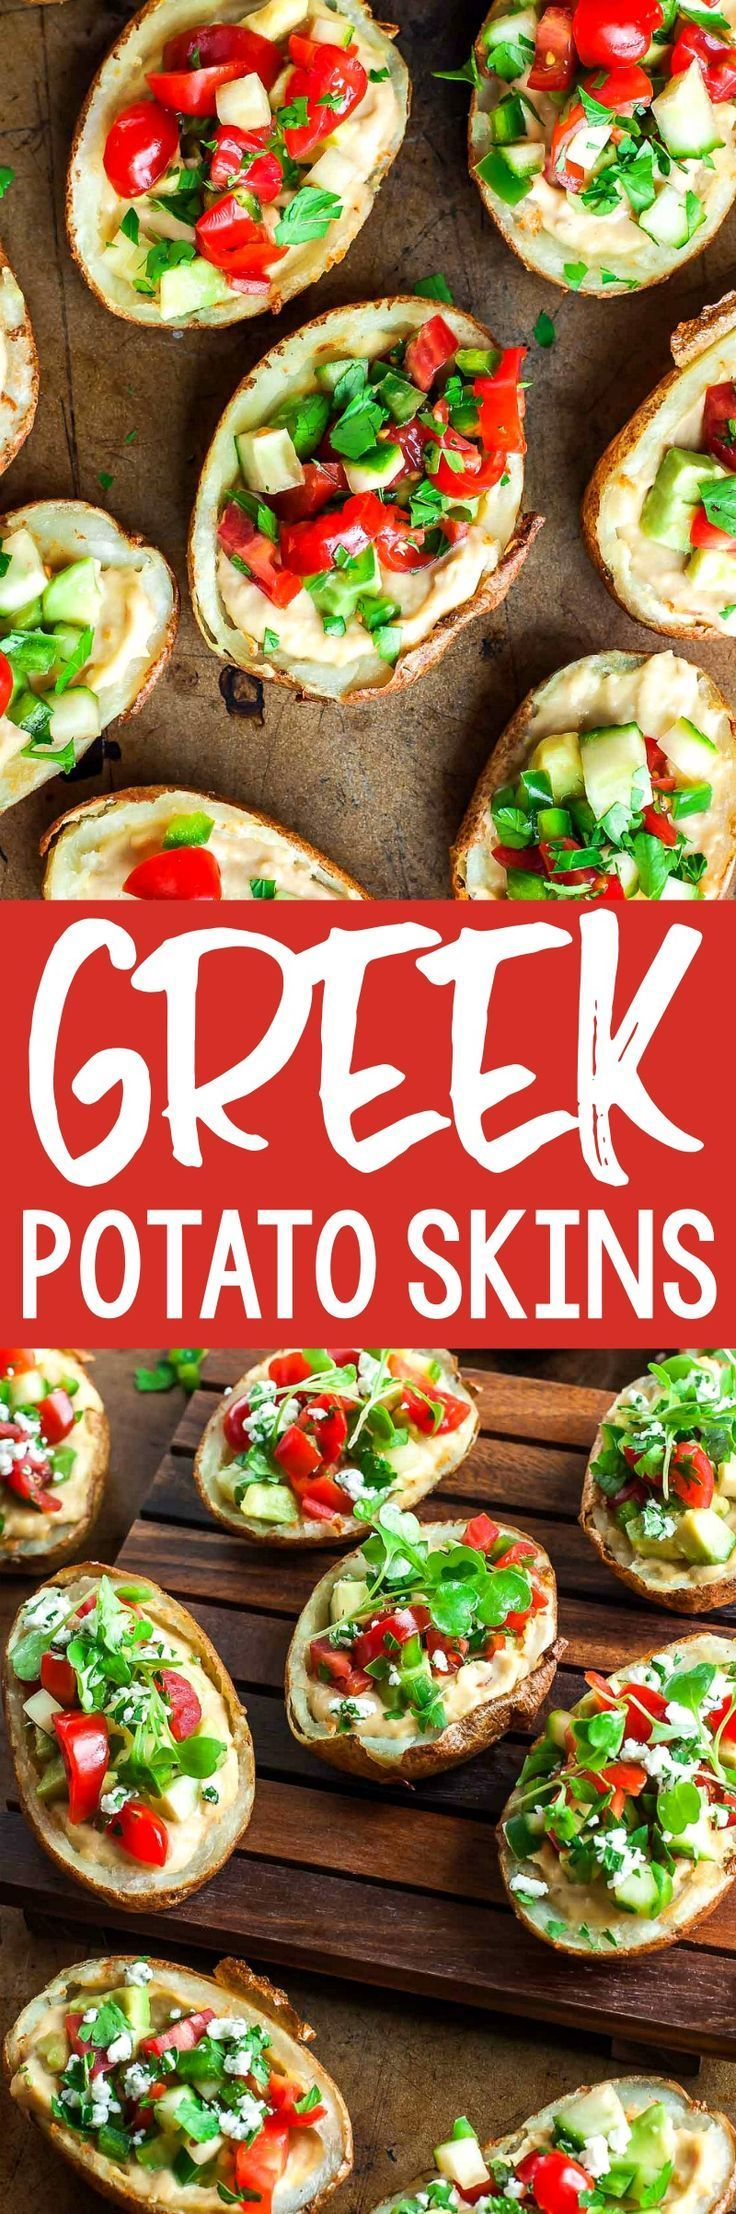 Greek Potato Skins with Roasted Garlic Hummus